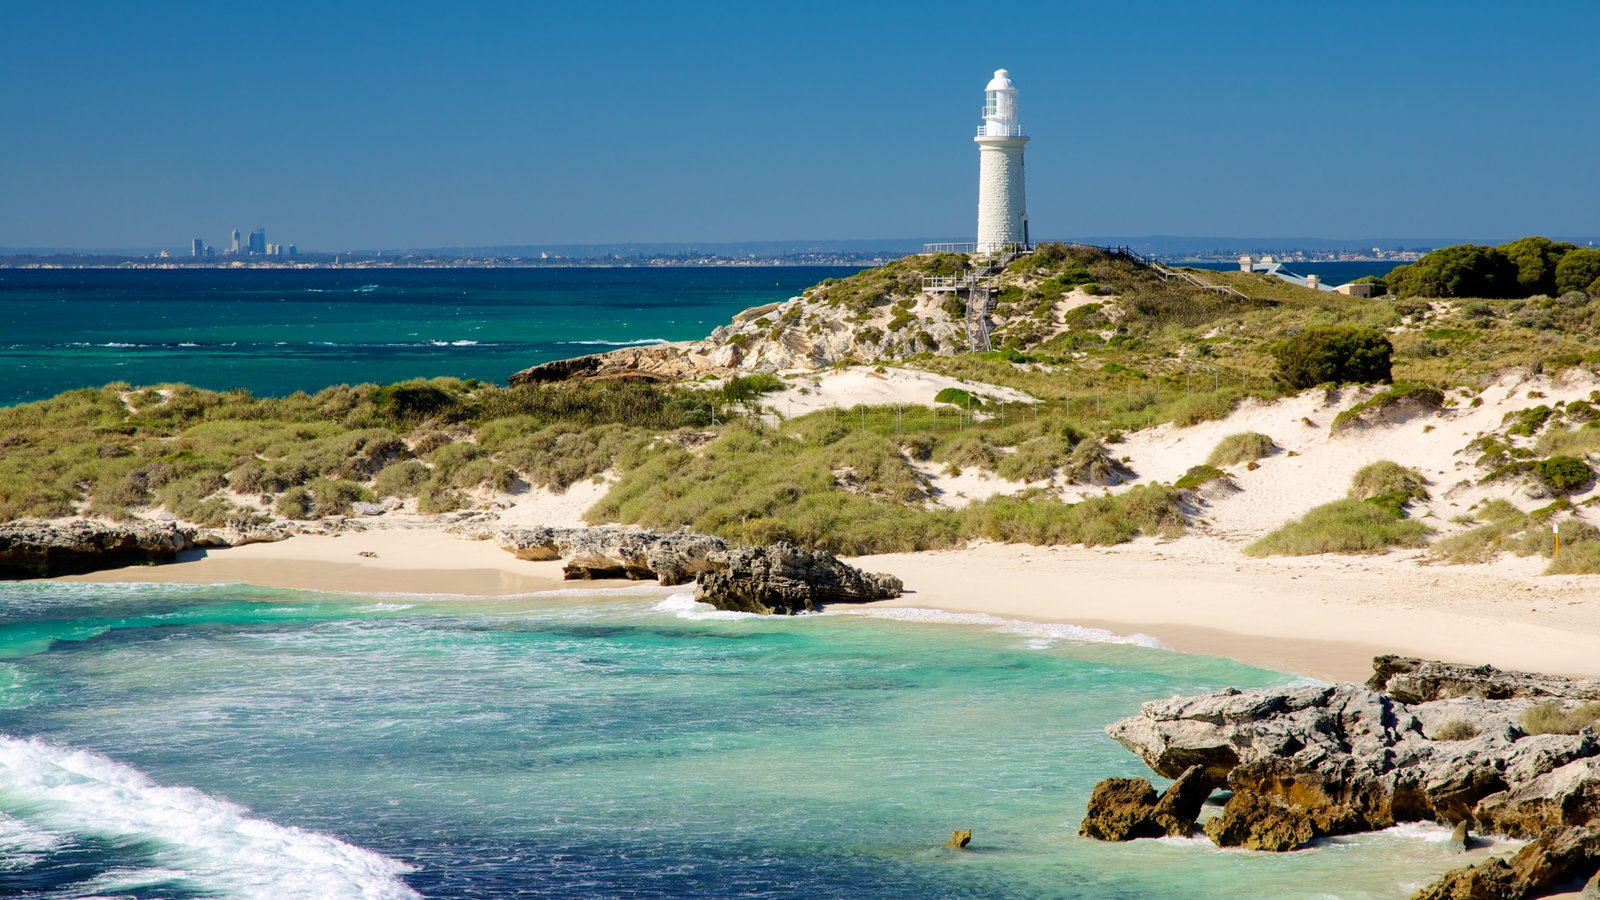 Rottnest Island featuring a sandy beach, a lighthouse and landscape views